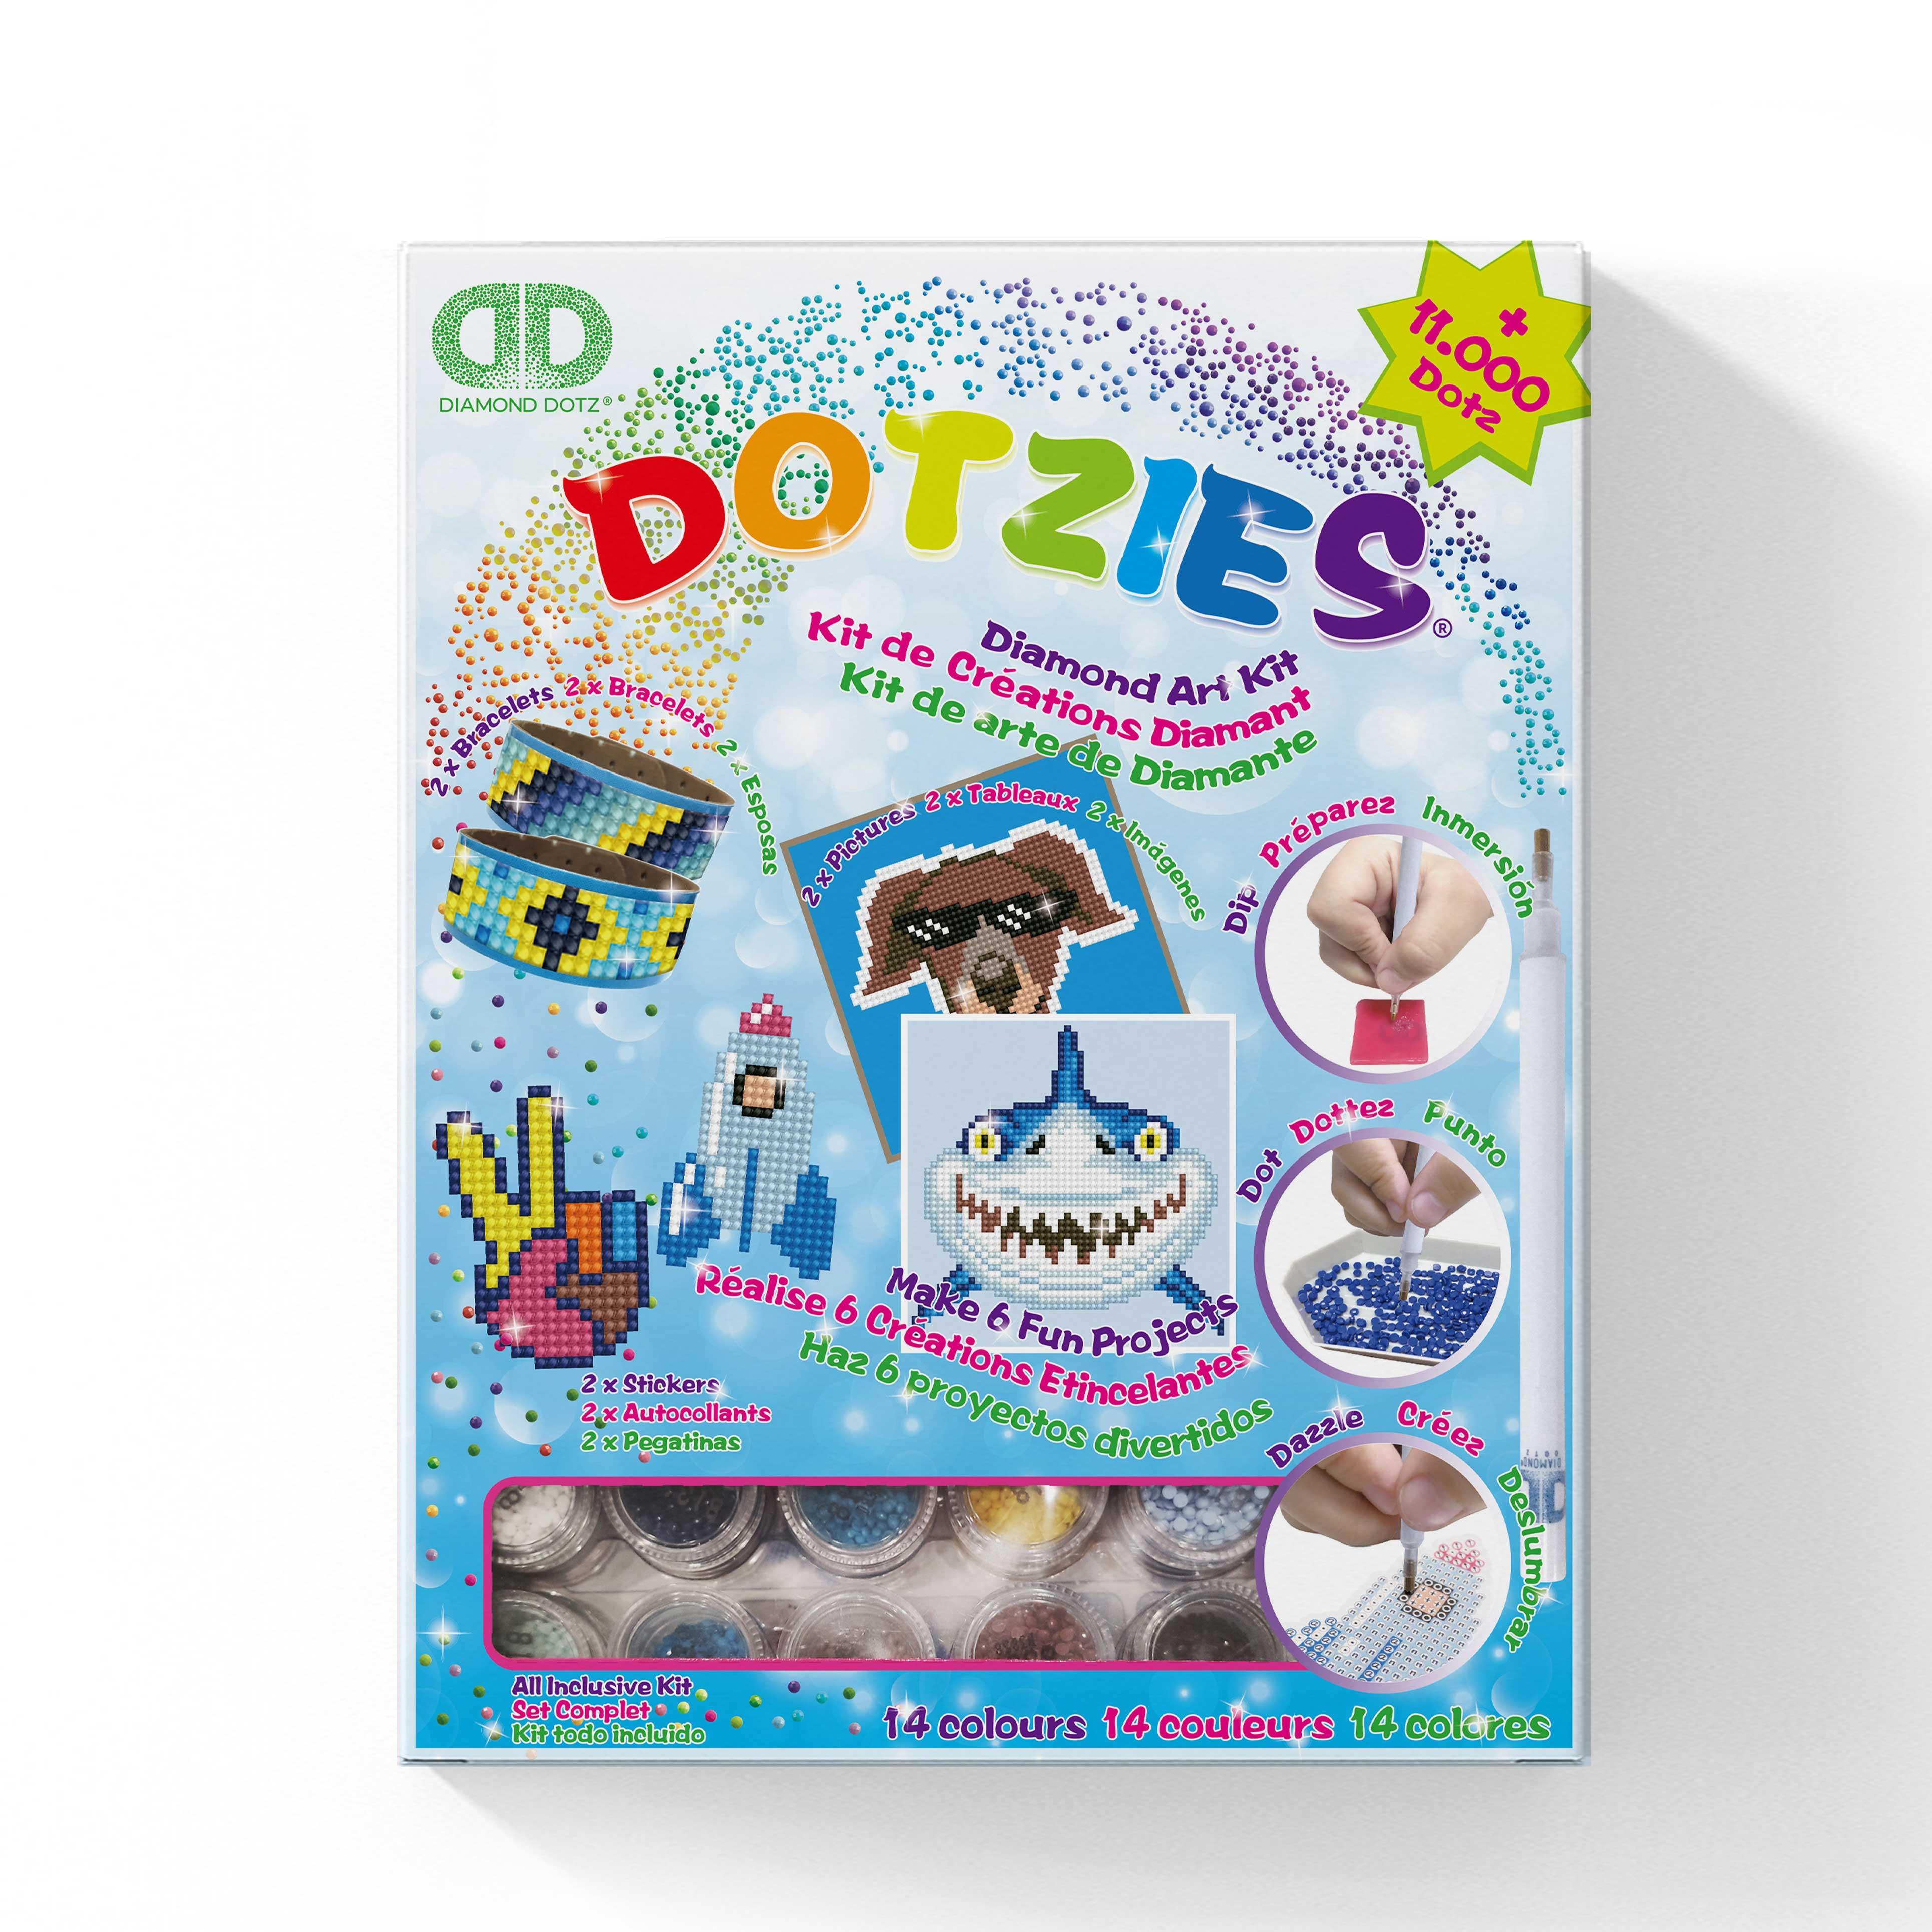 DTZ10.002_packaging